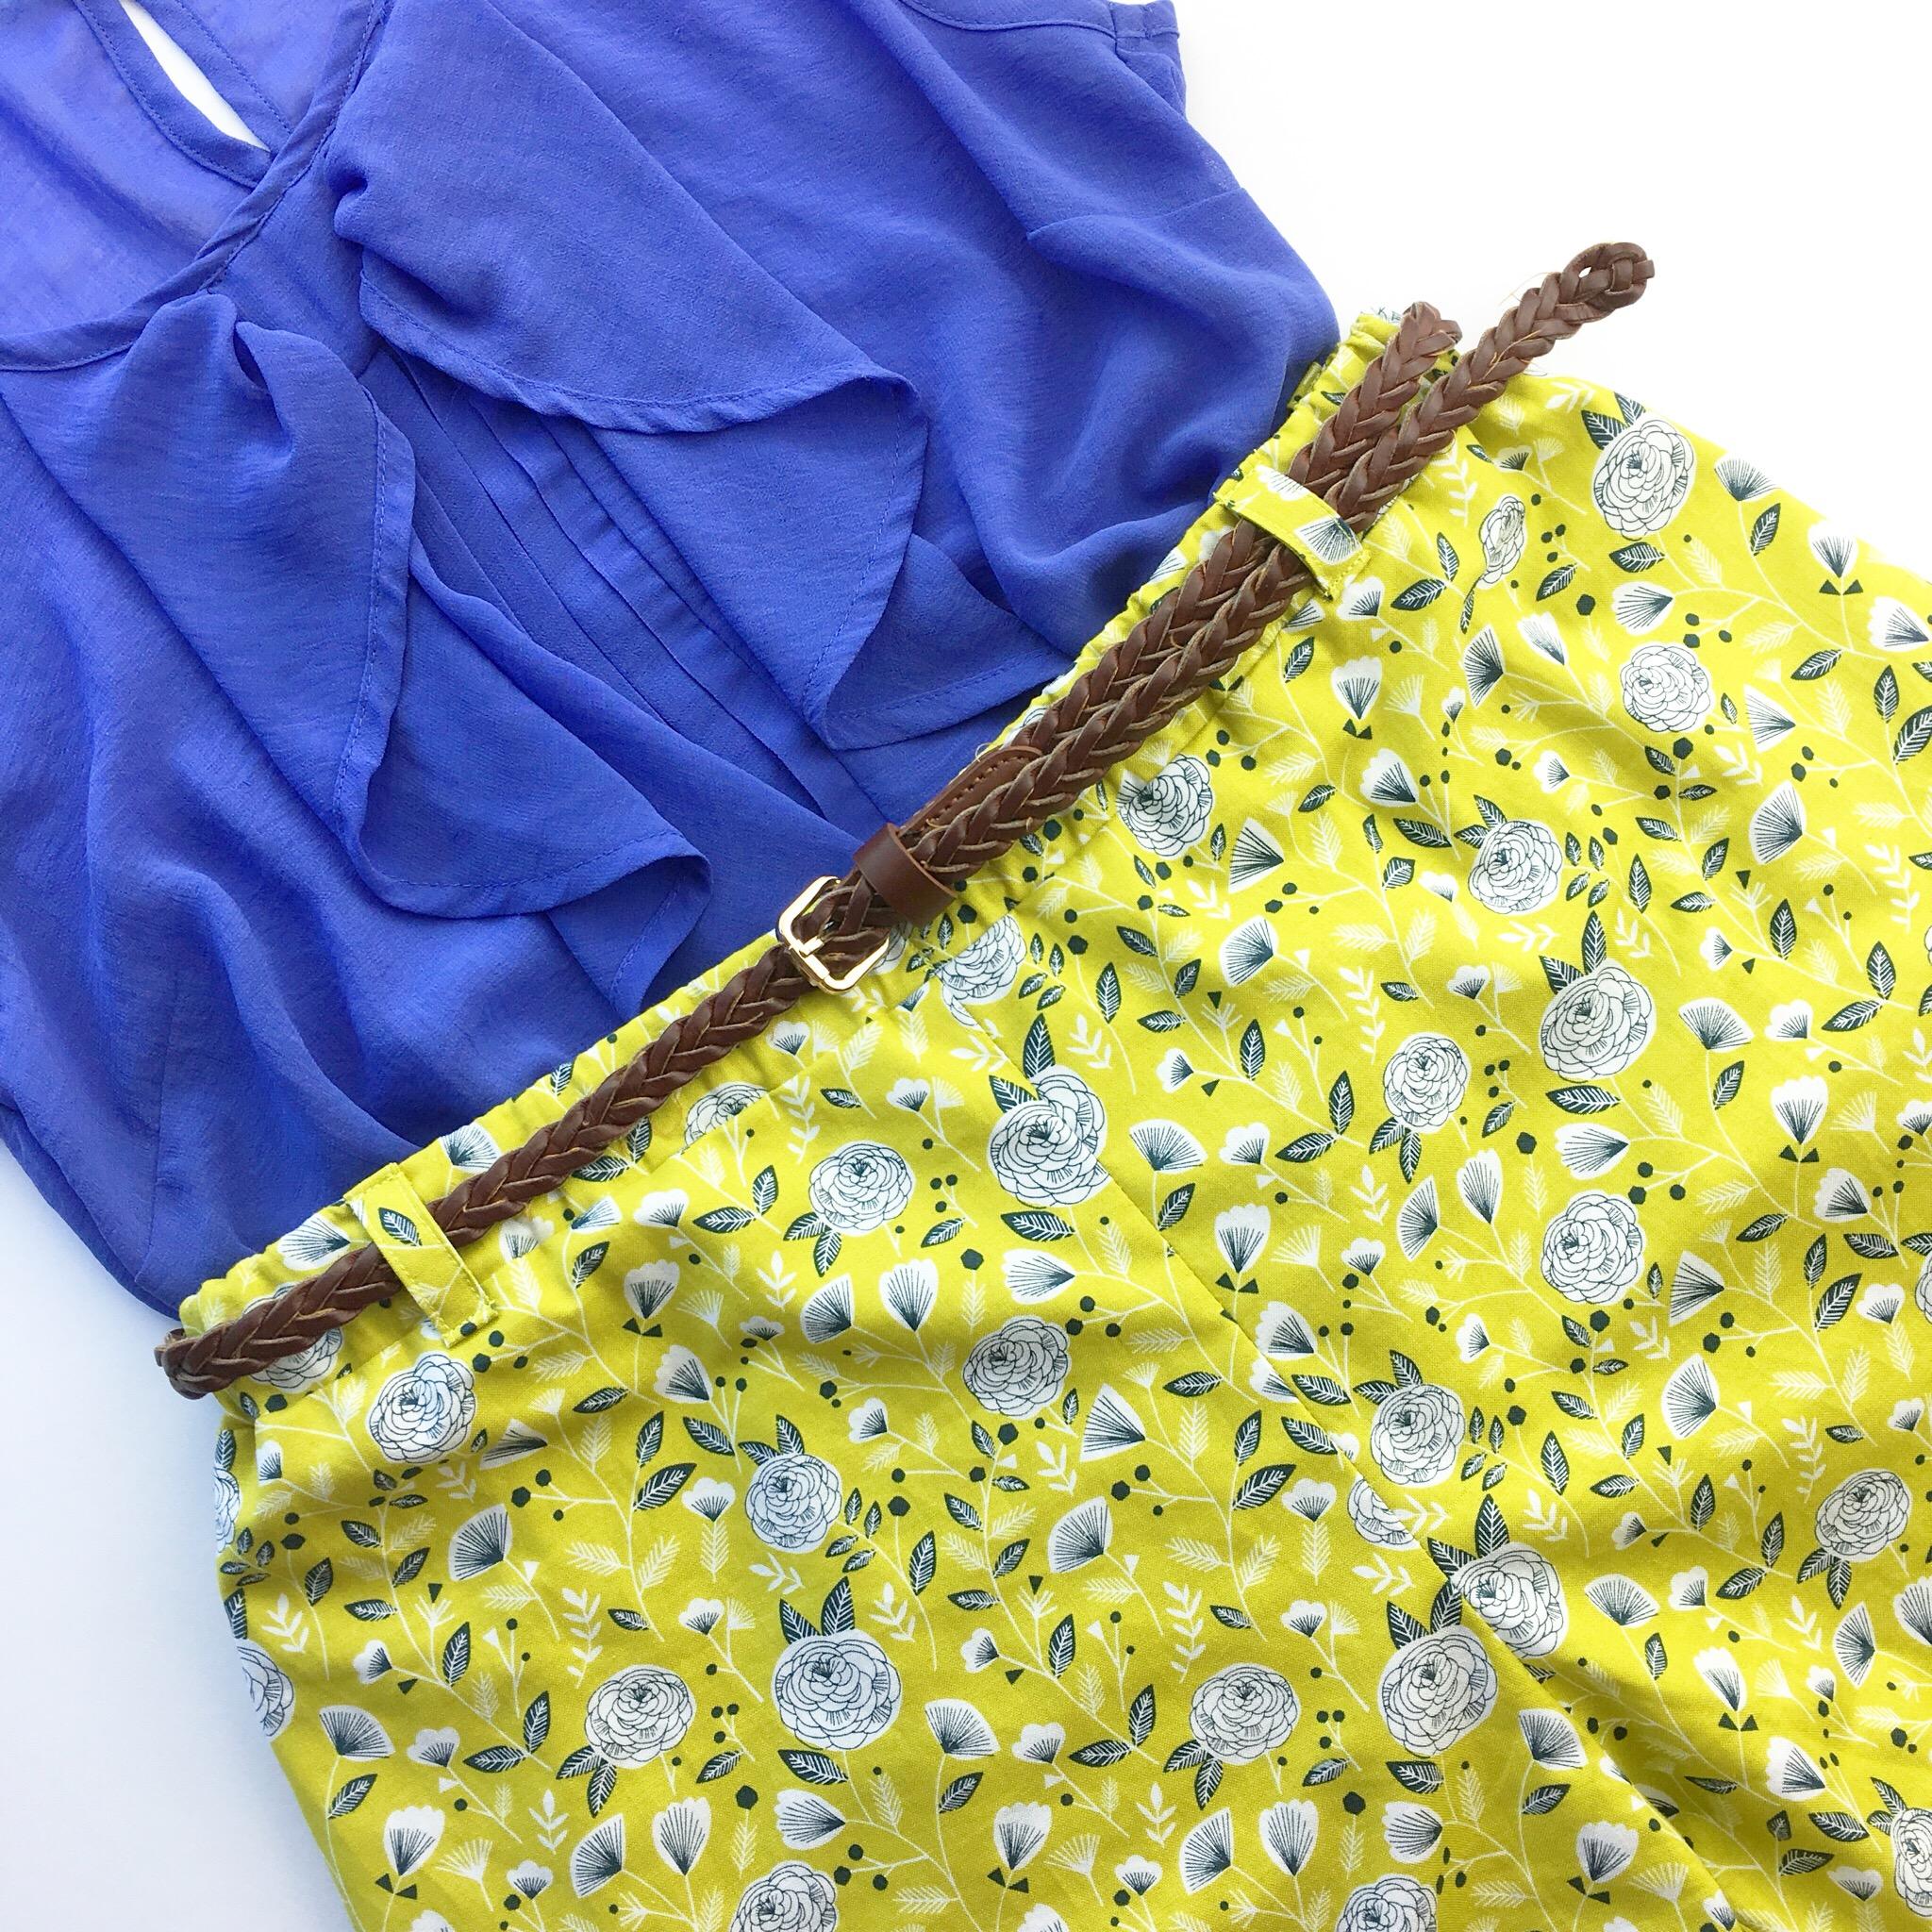 Kirsty's PJ Shorts